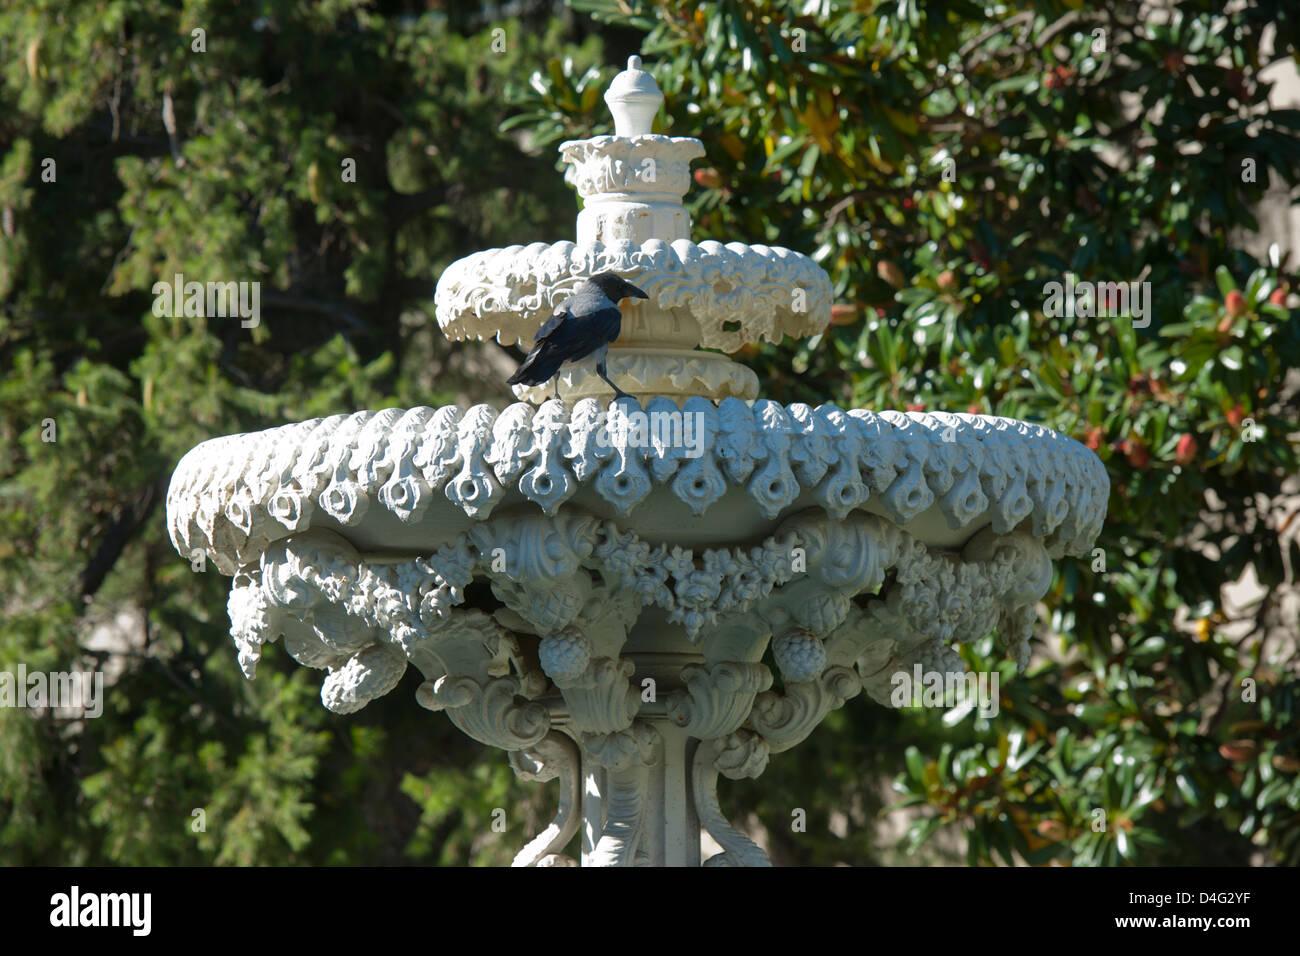 Türkei, Istanbul, Besiktas, der Dolmabahce-Palast oder Dolmabahce Sarayi, Palast der aufgeschütteten Gärten Stock Photo